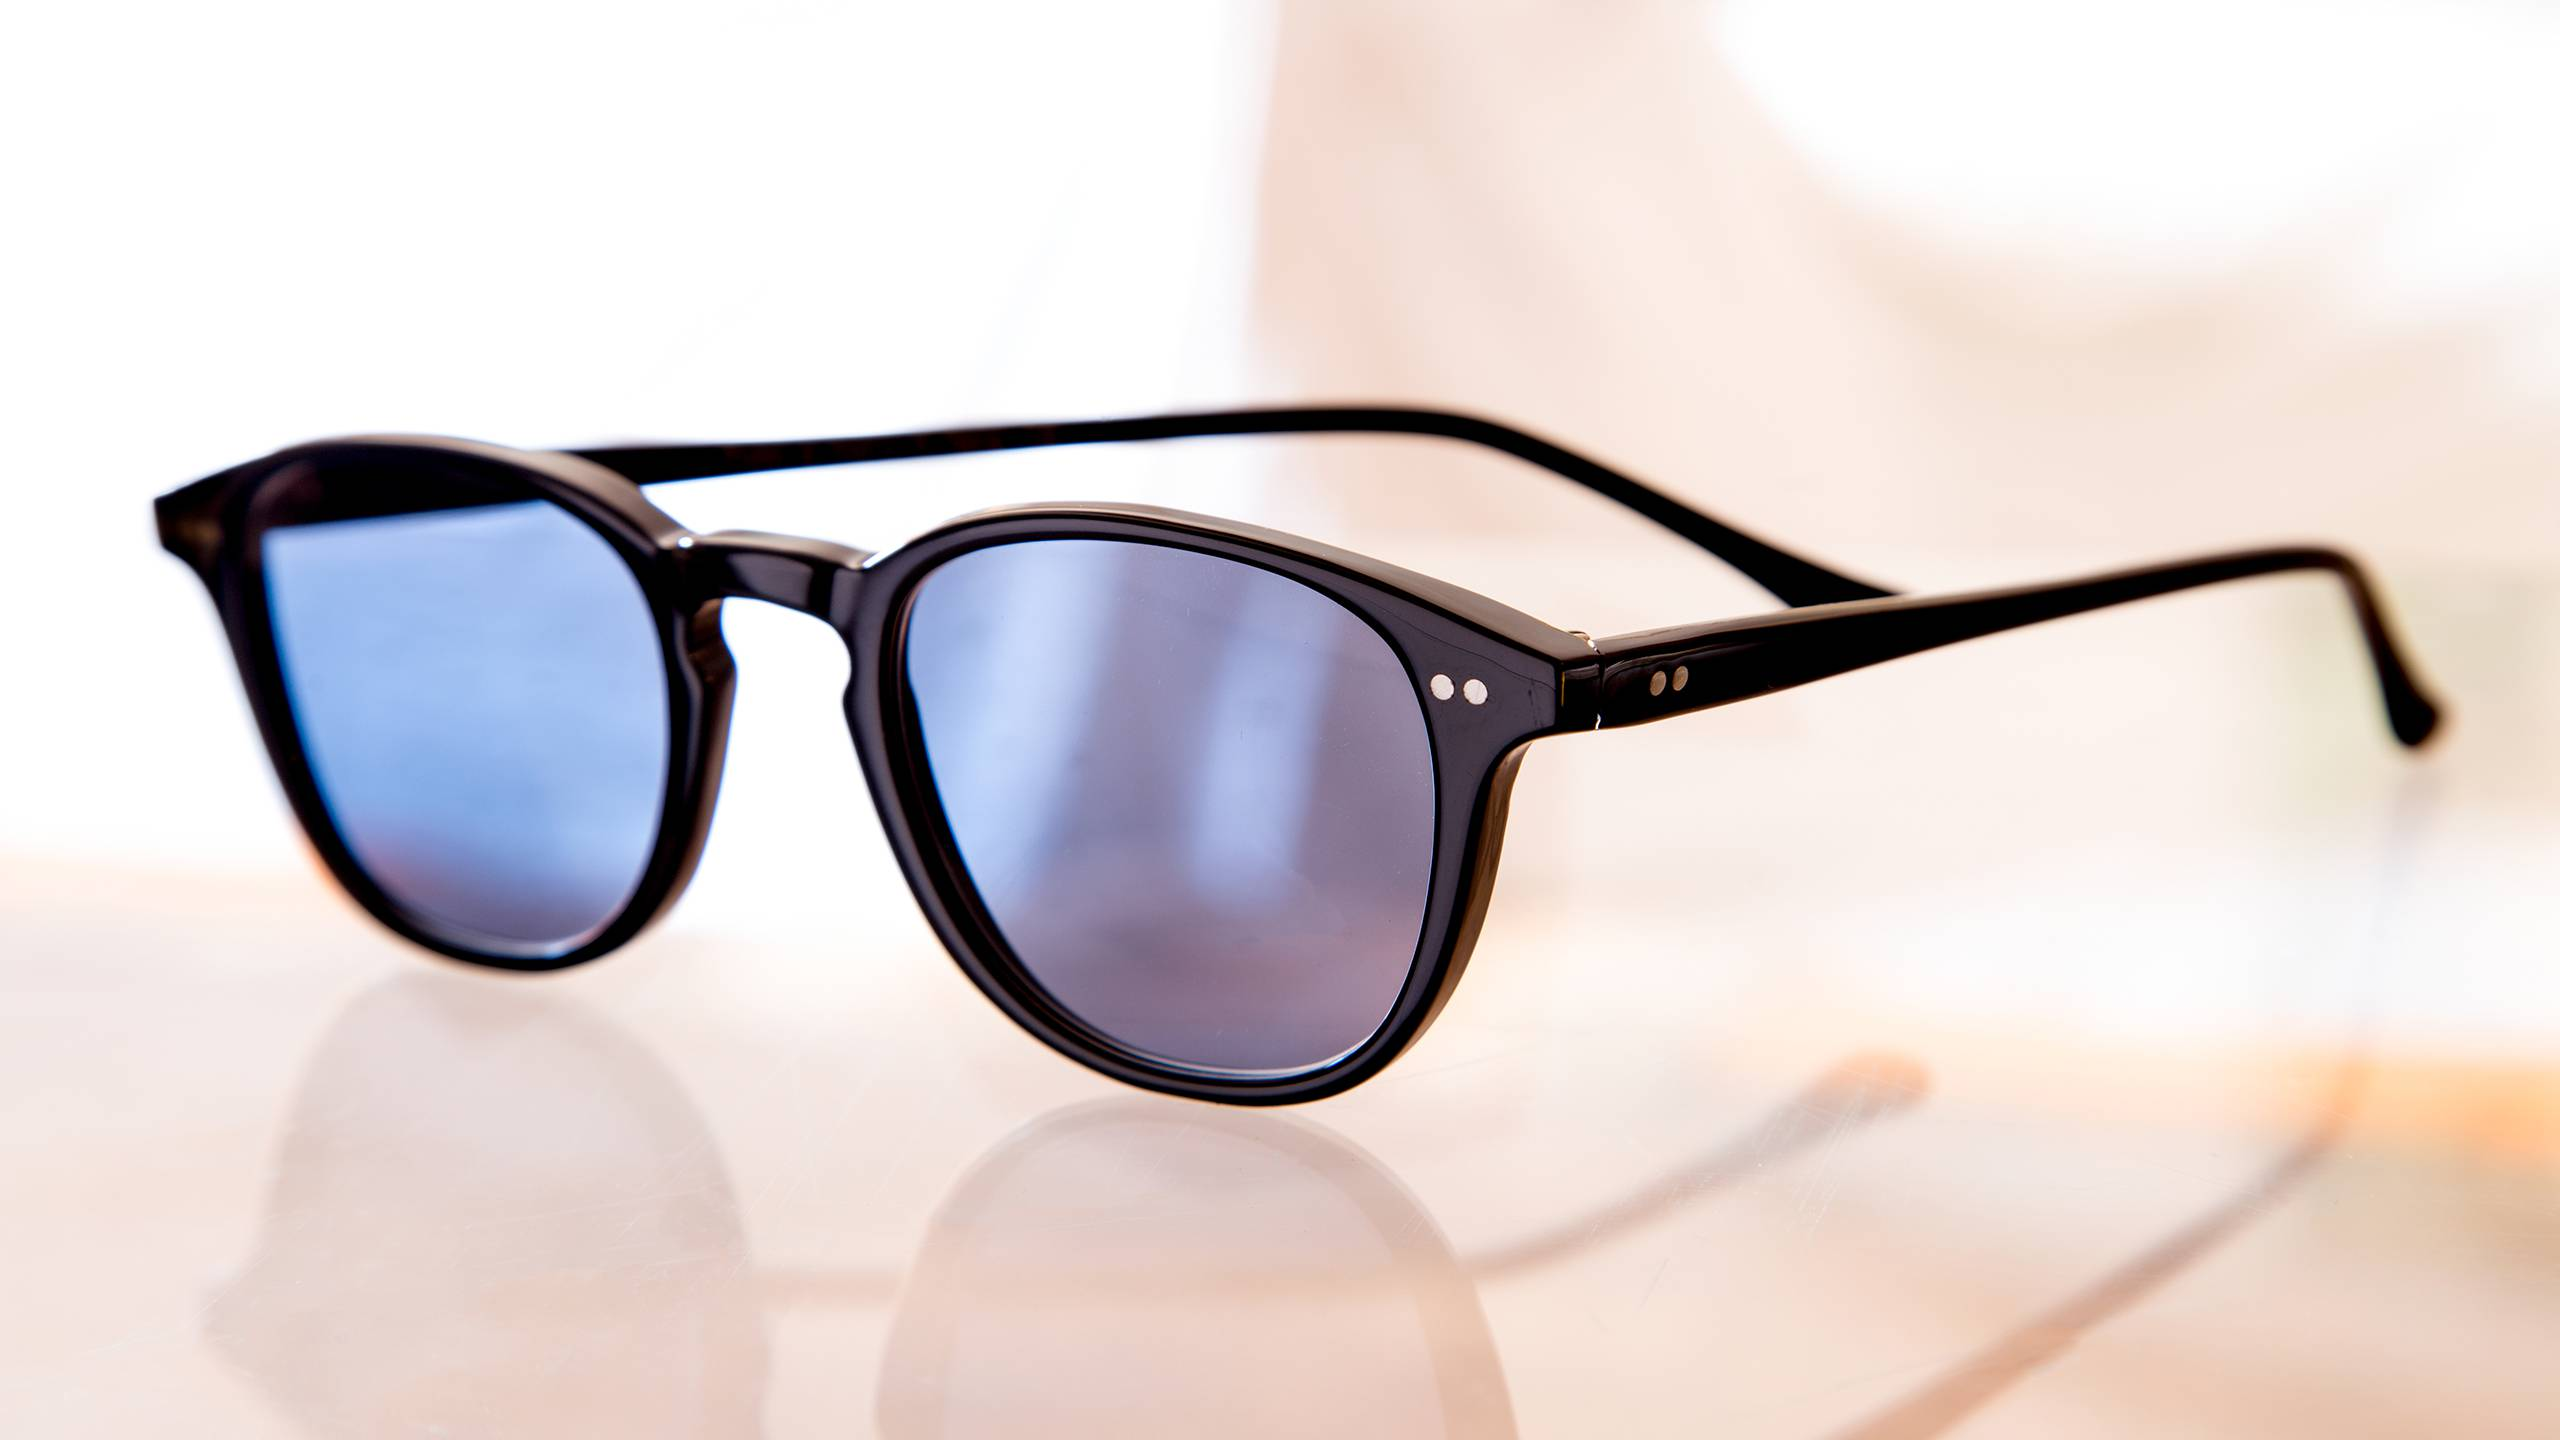 eyeglasses-Nathan-Kaltermann-made-in-Italy-IMG-0130